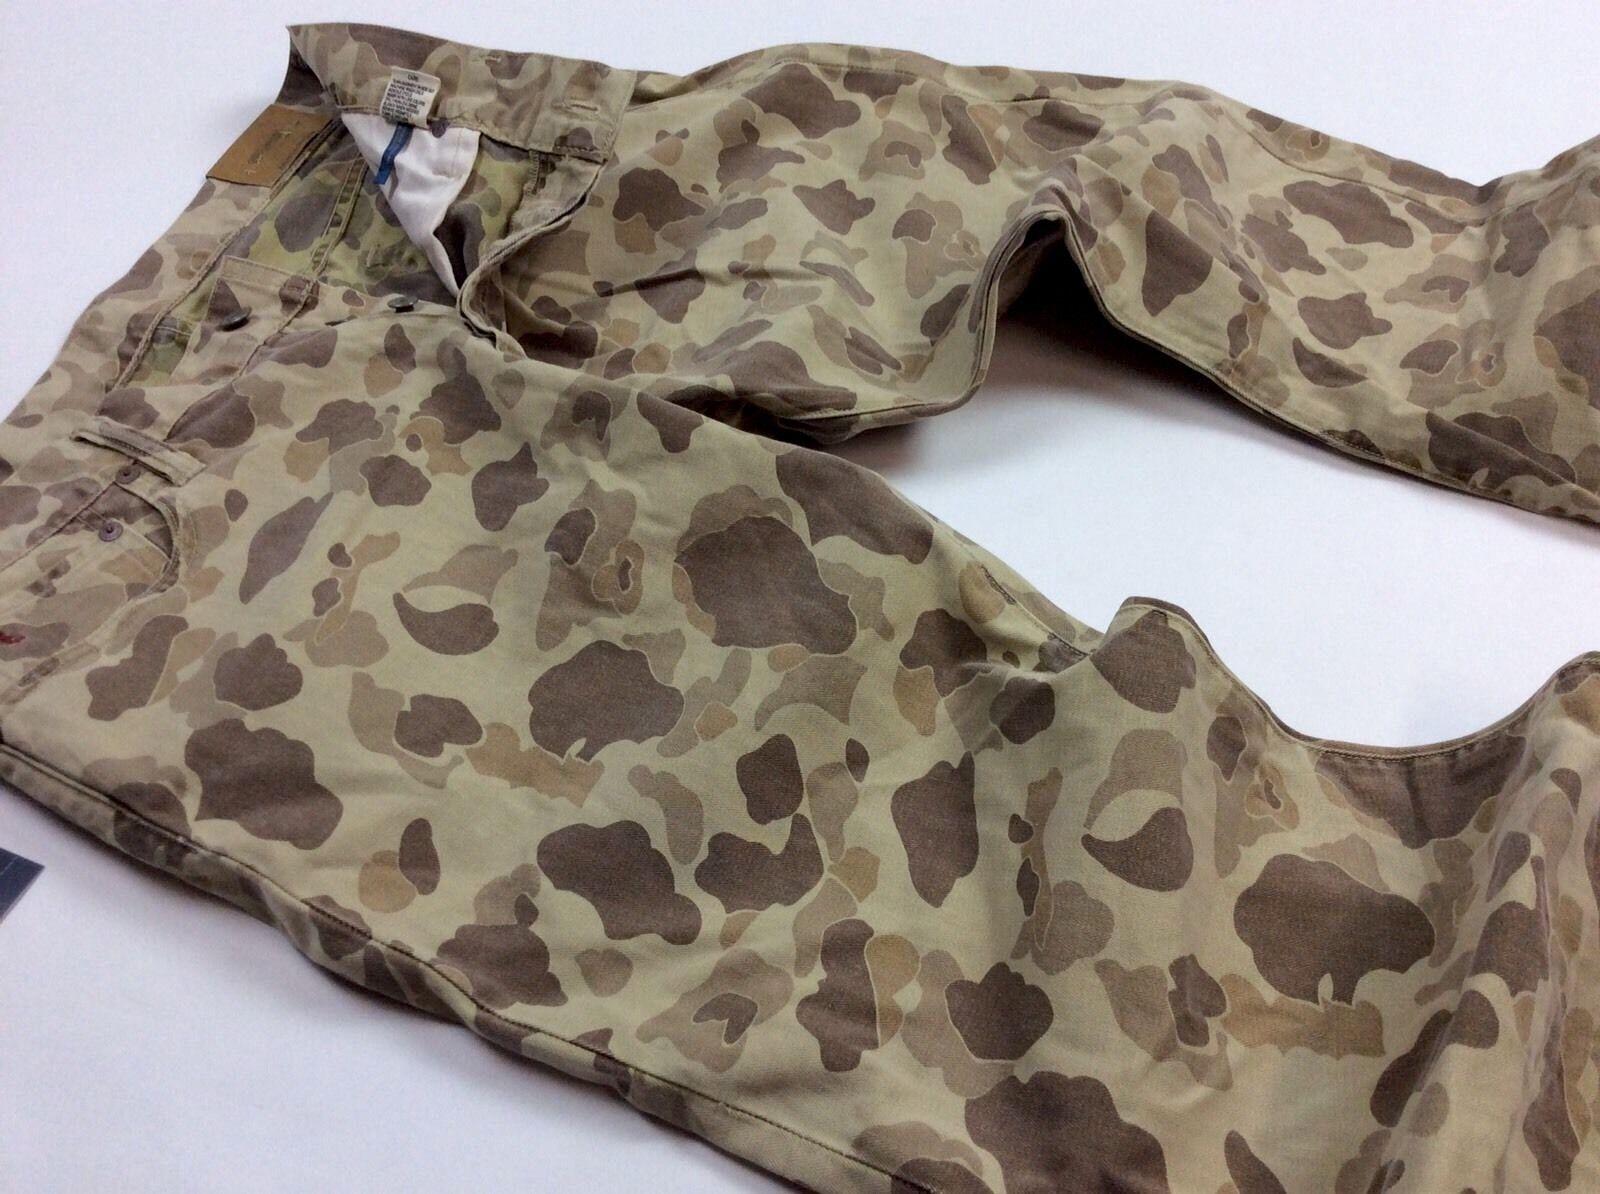 Polo Ralph Lauren Men Military USA Army Desert Safari Camo Stretch Slim Jeans